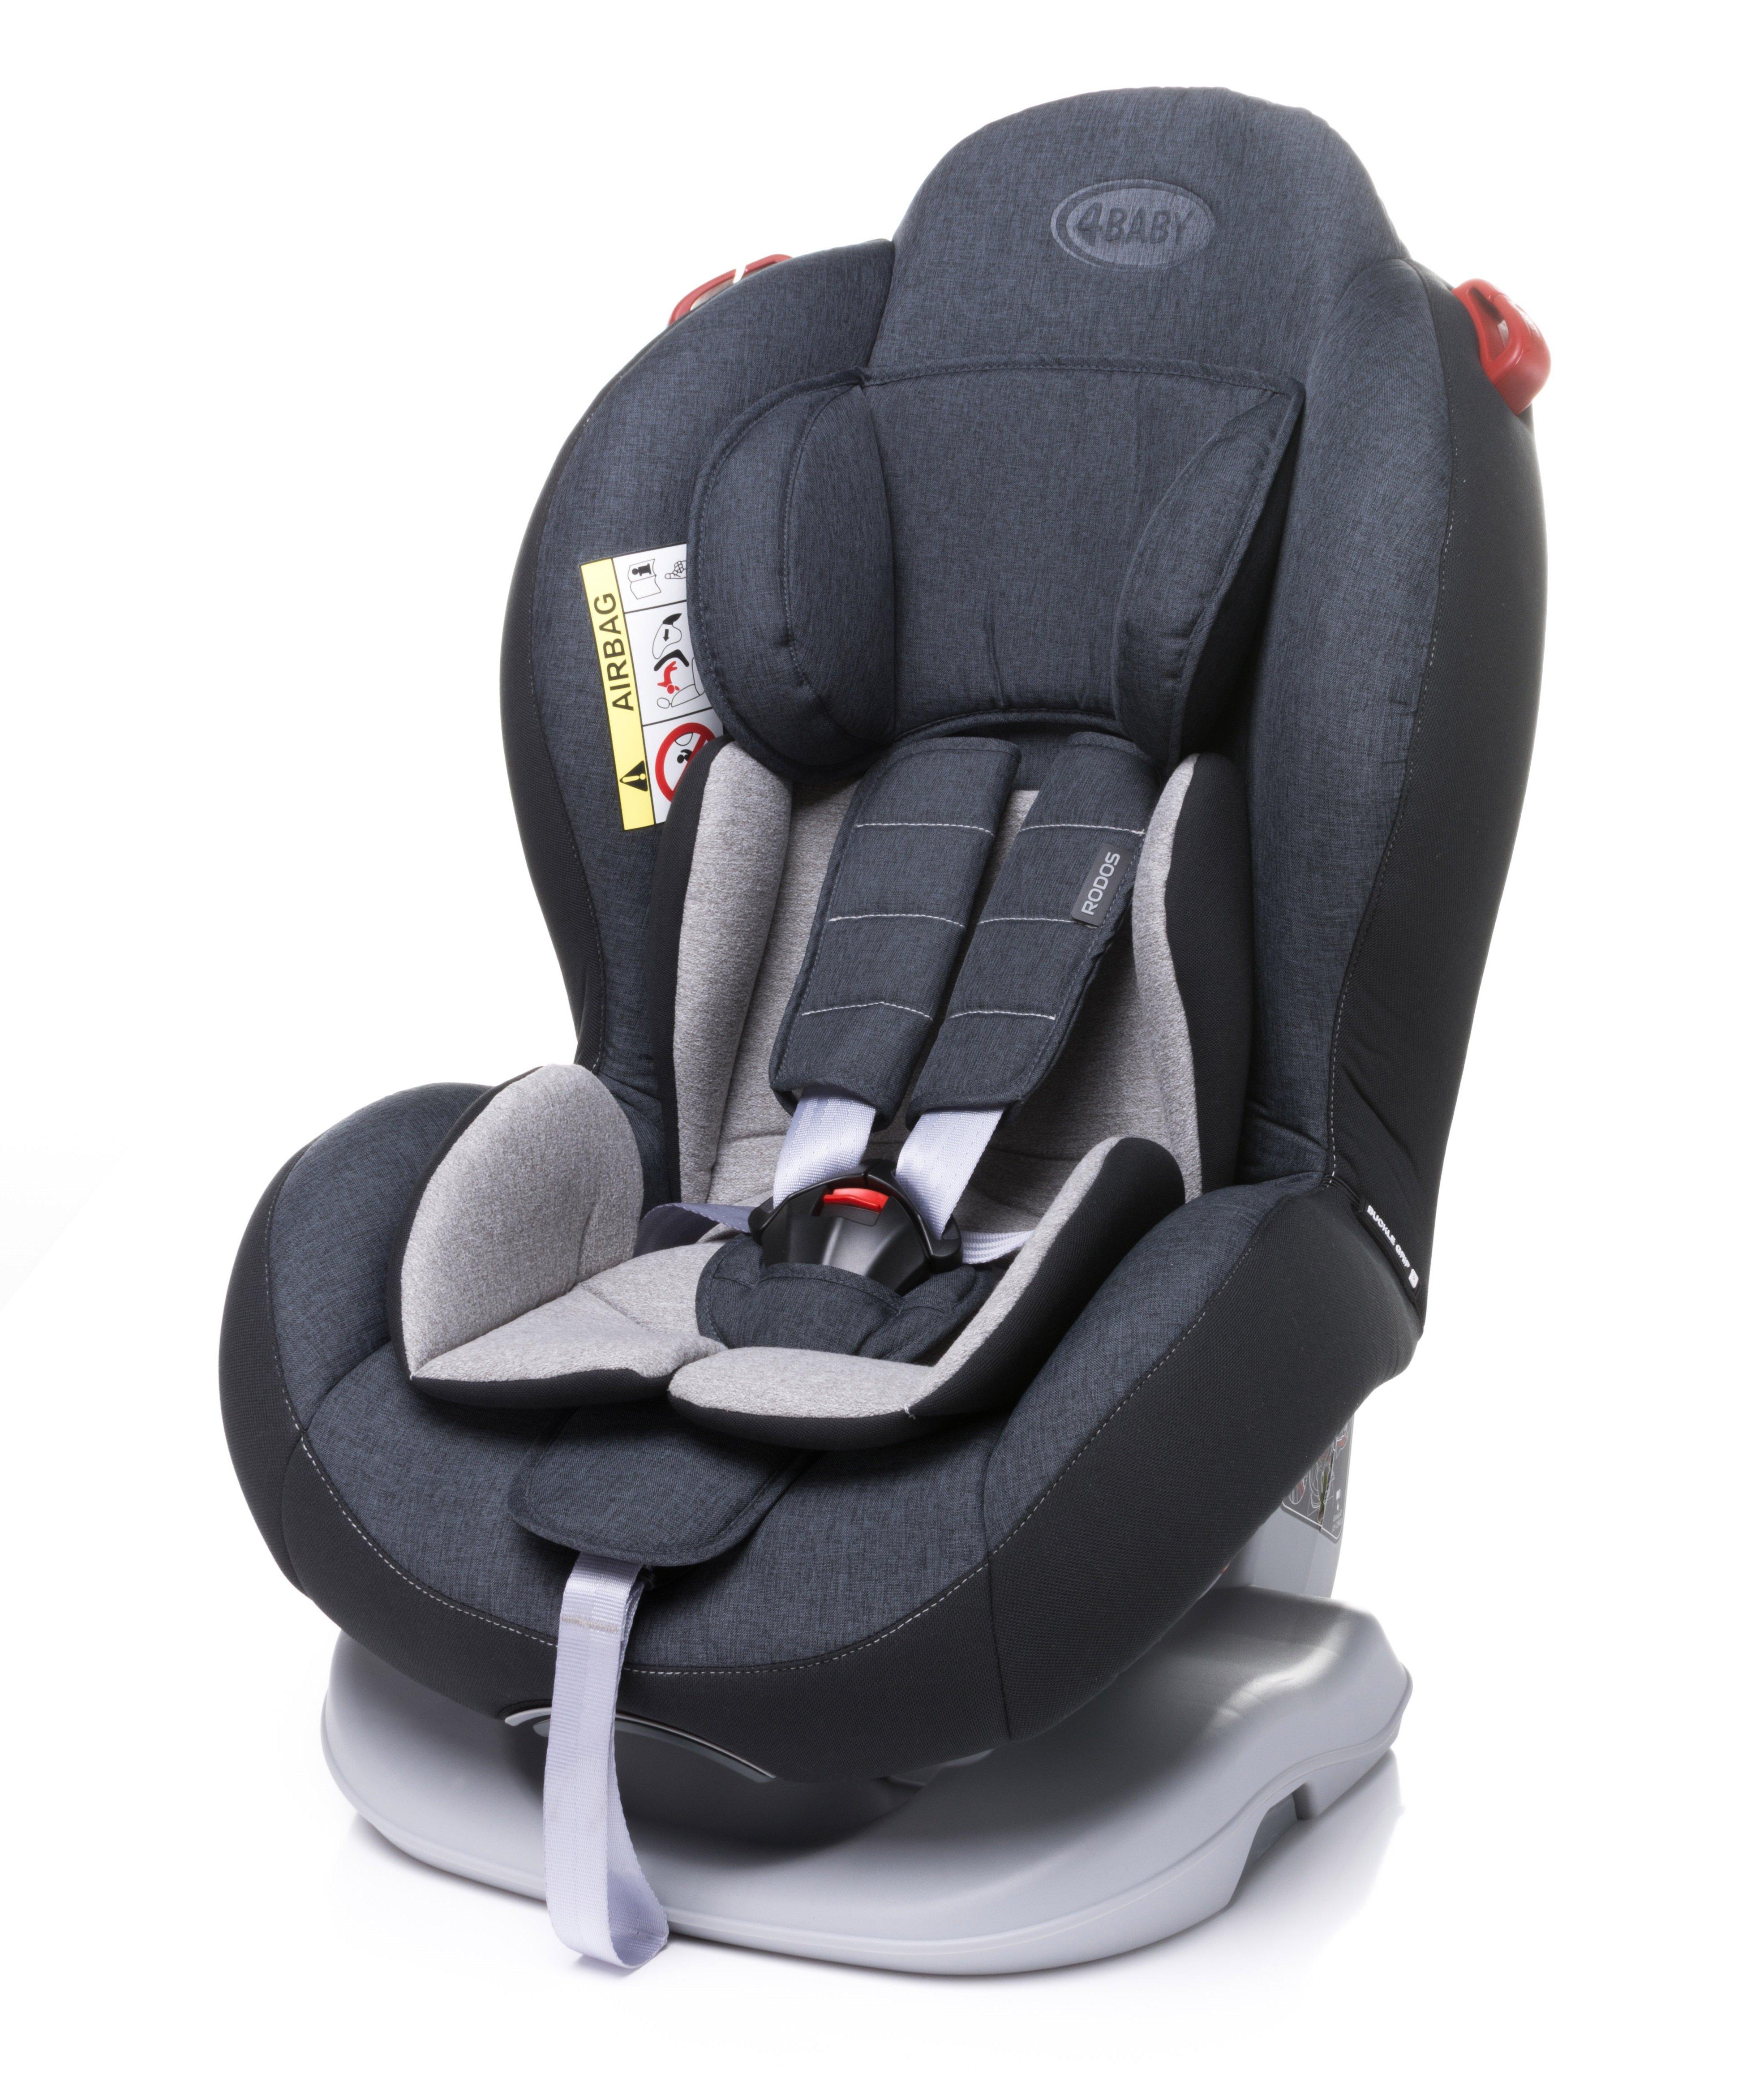 Bērnu autosēdeklis 0-25 kg 4BABY RODOS dark grey